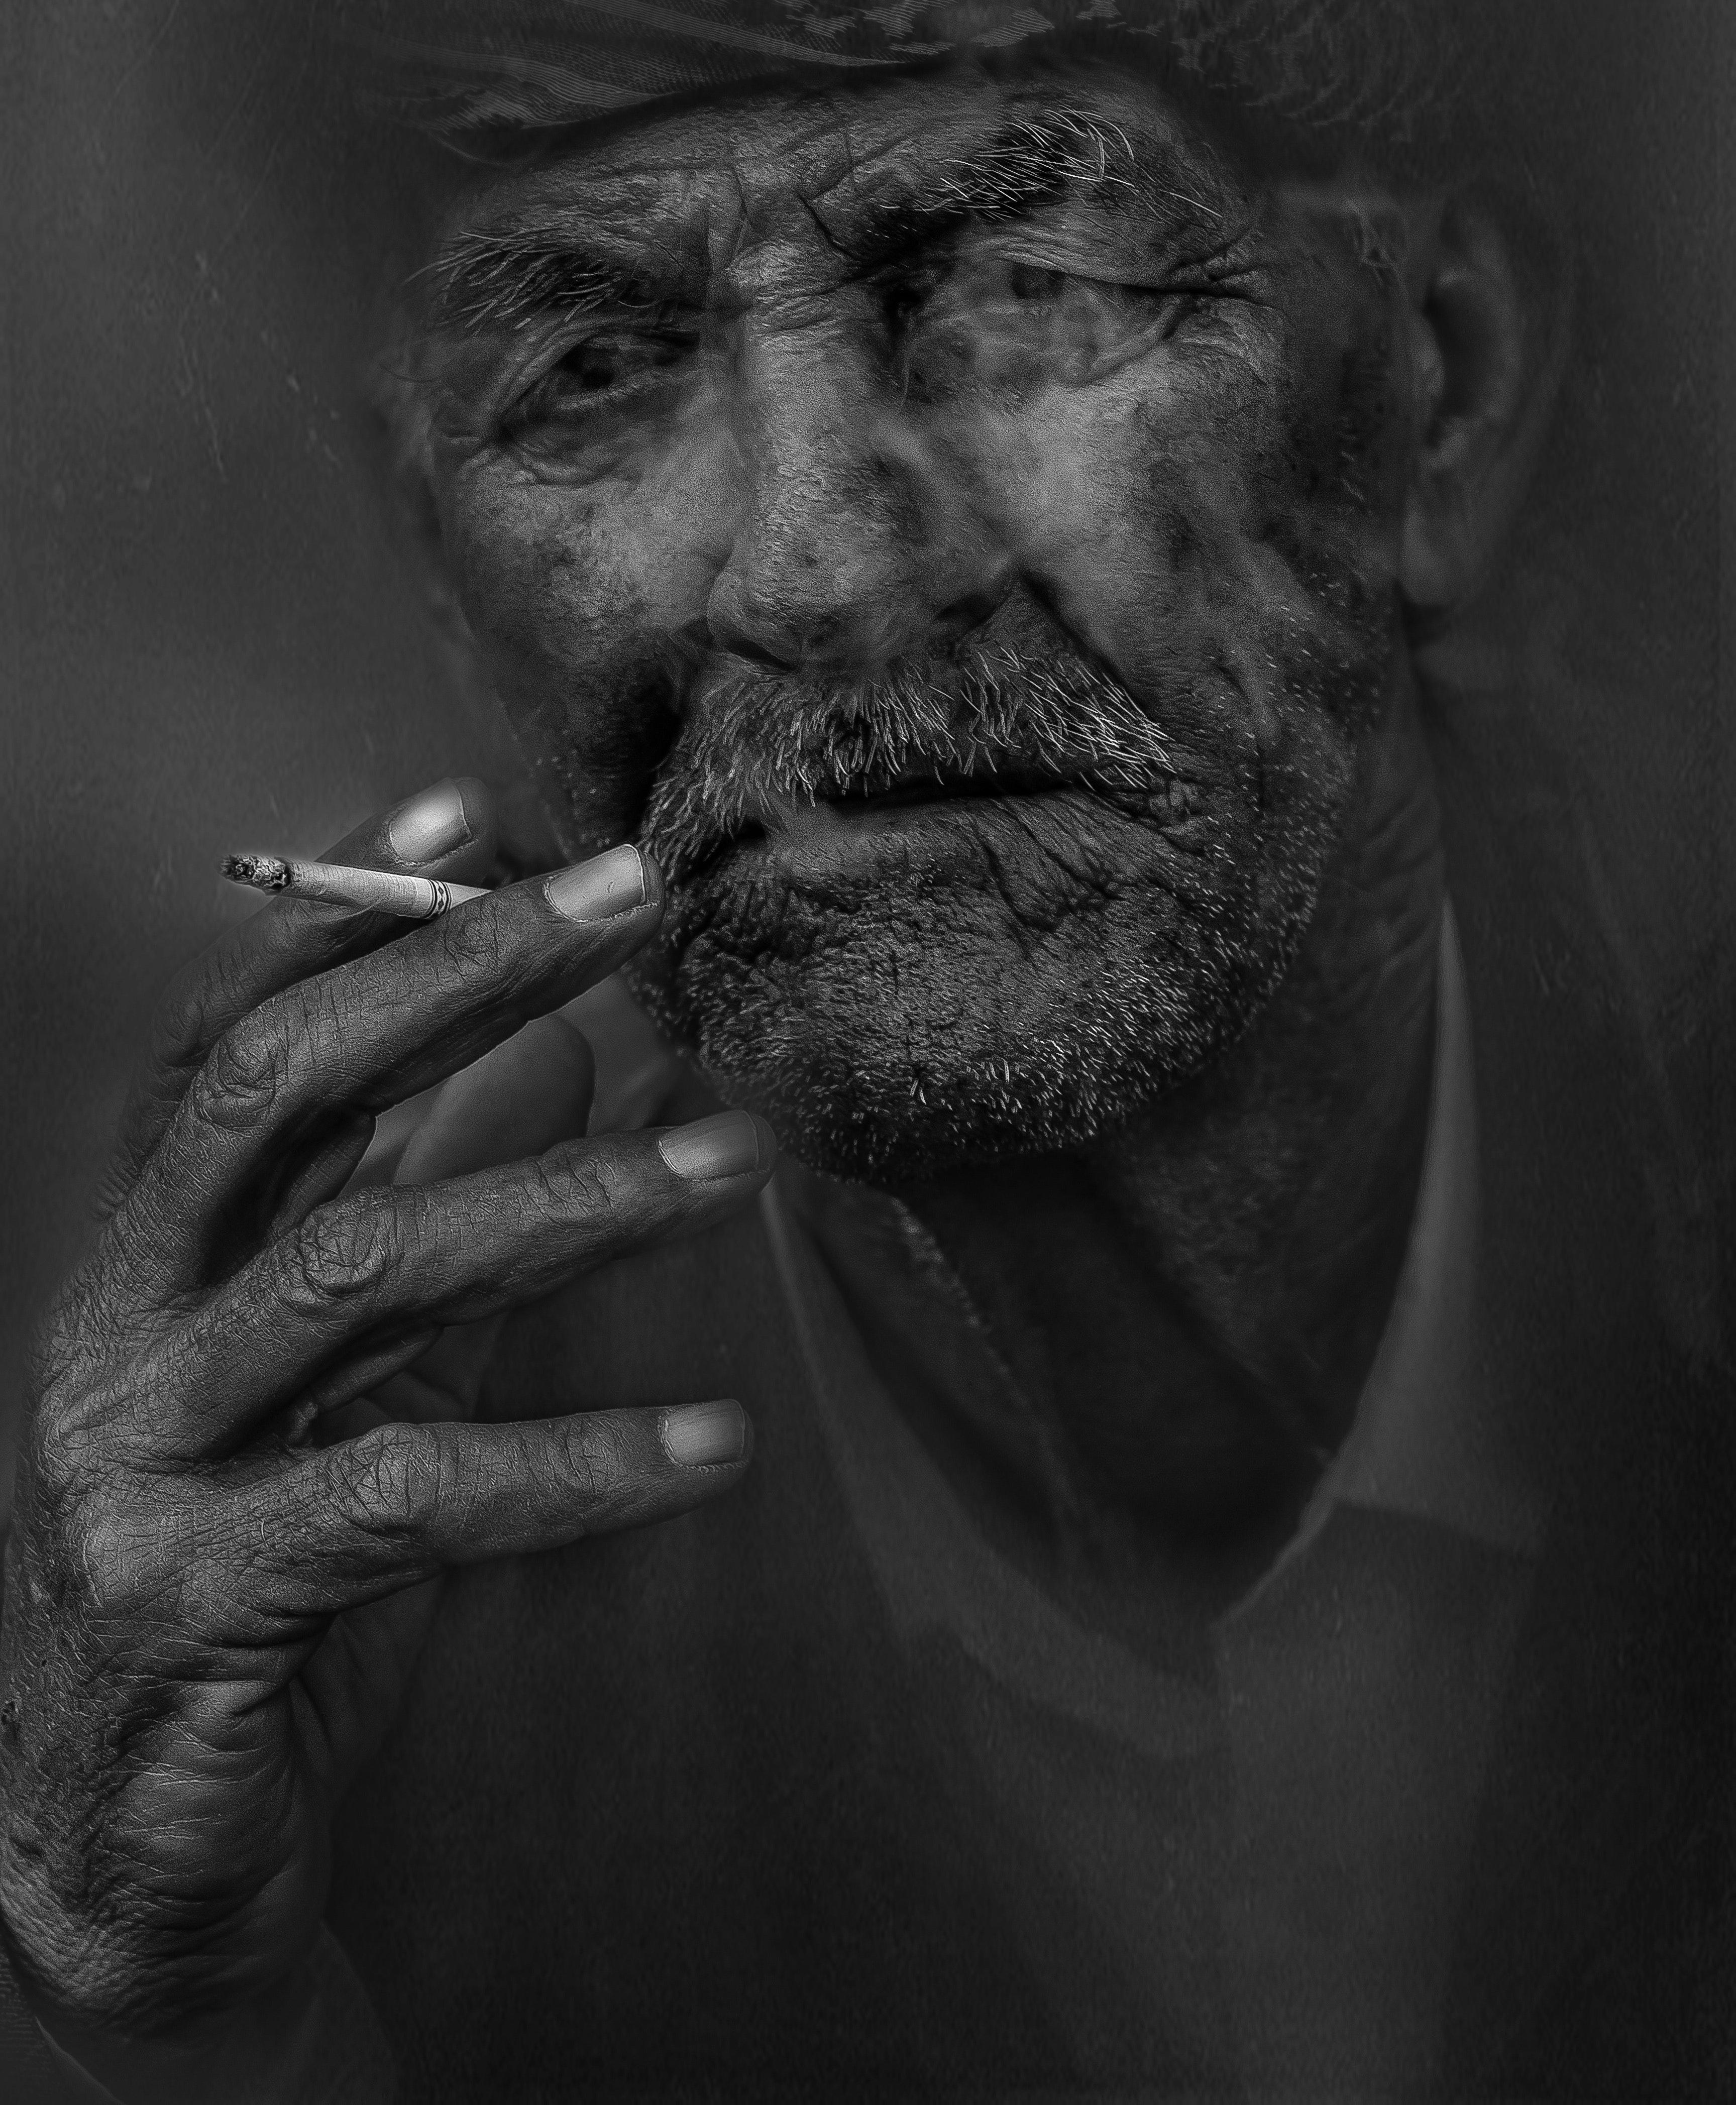 16+ Gambar Hitam Putih Rokok - Gani Gambar